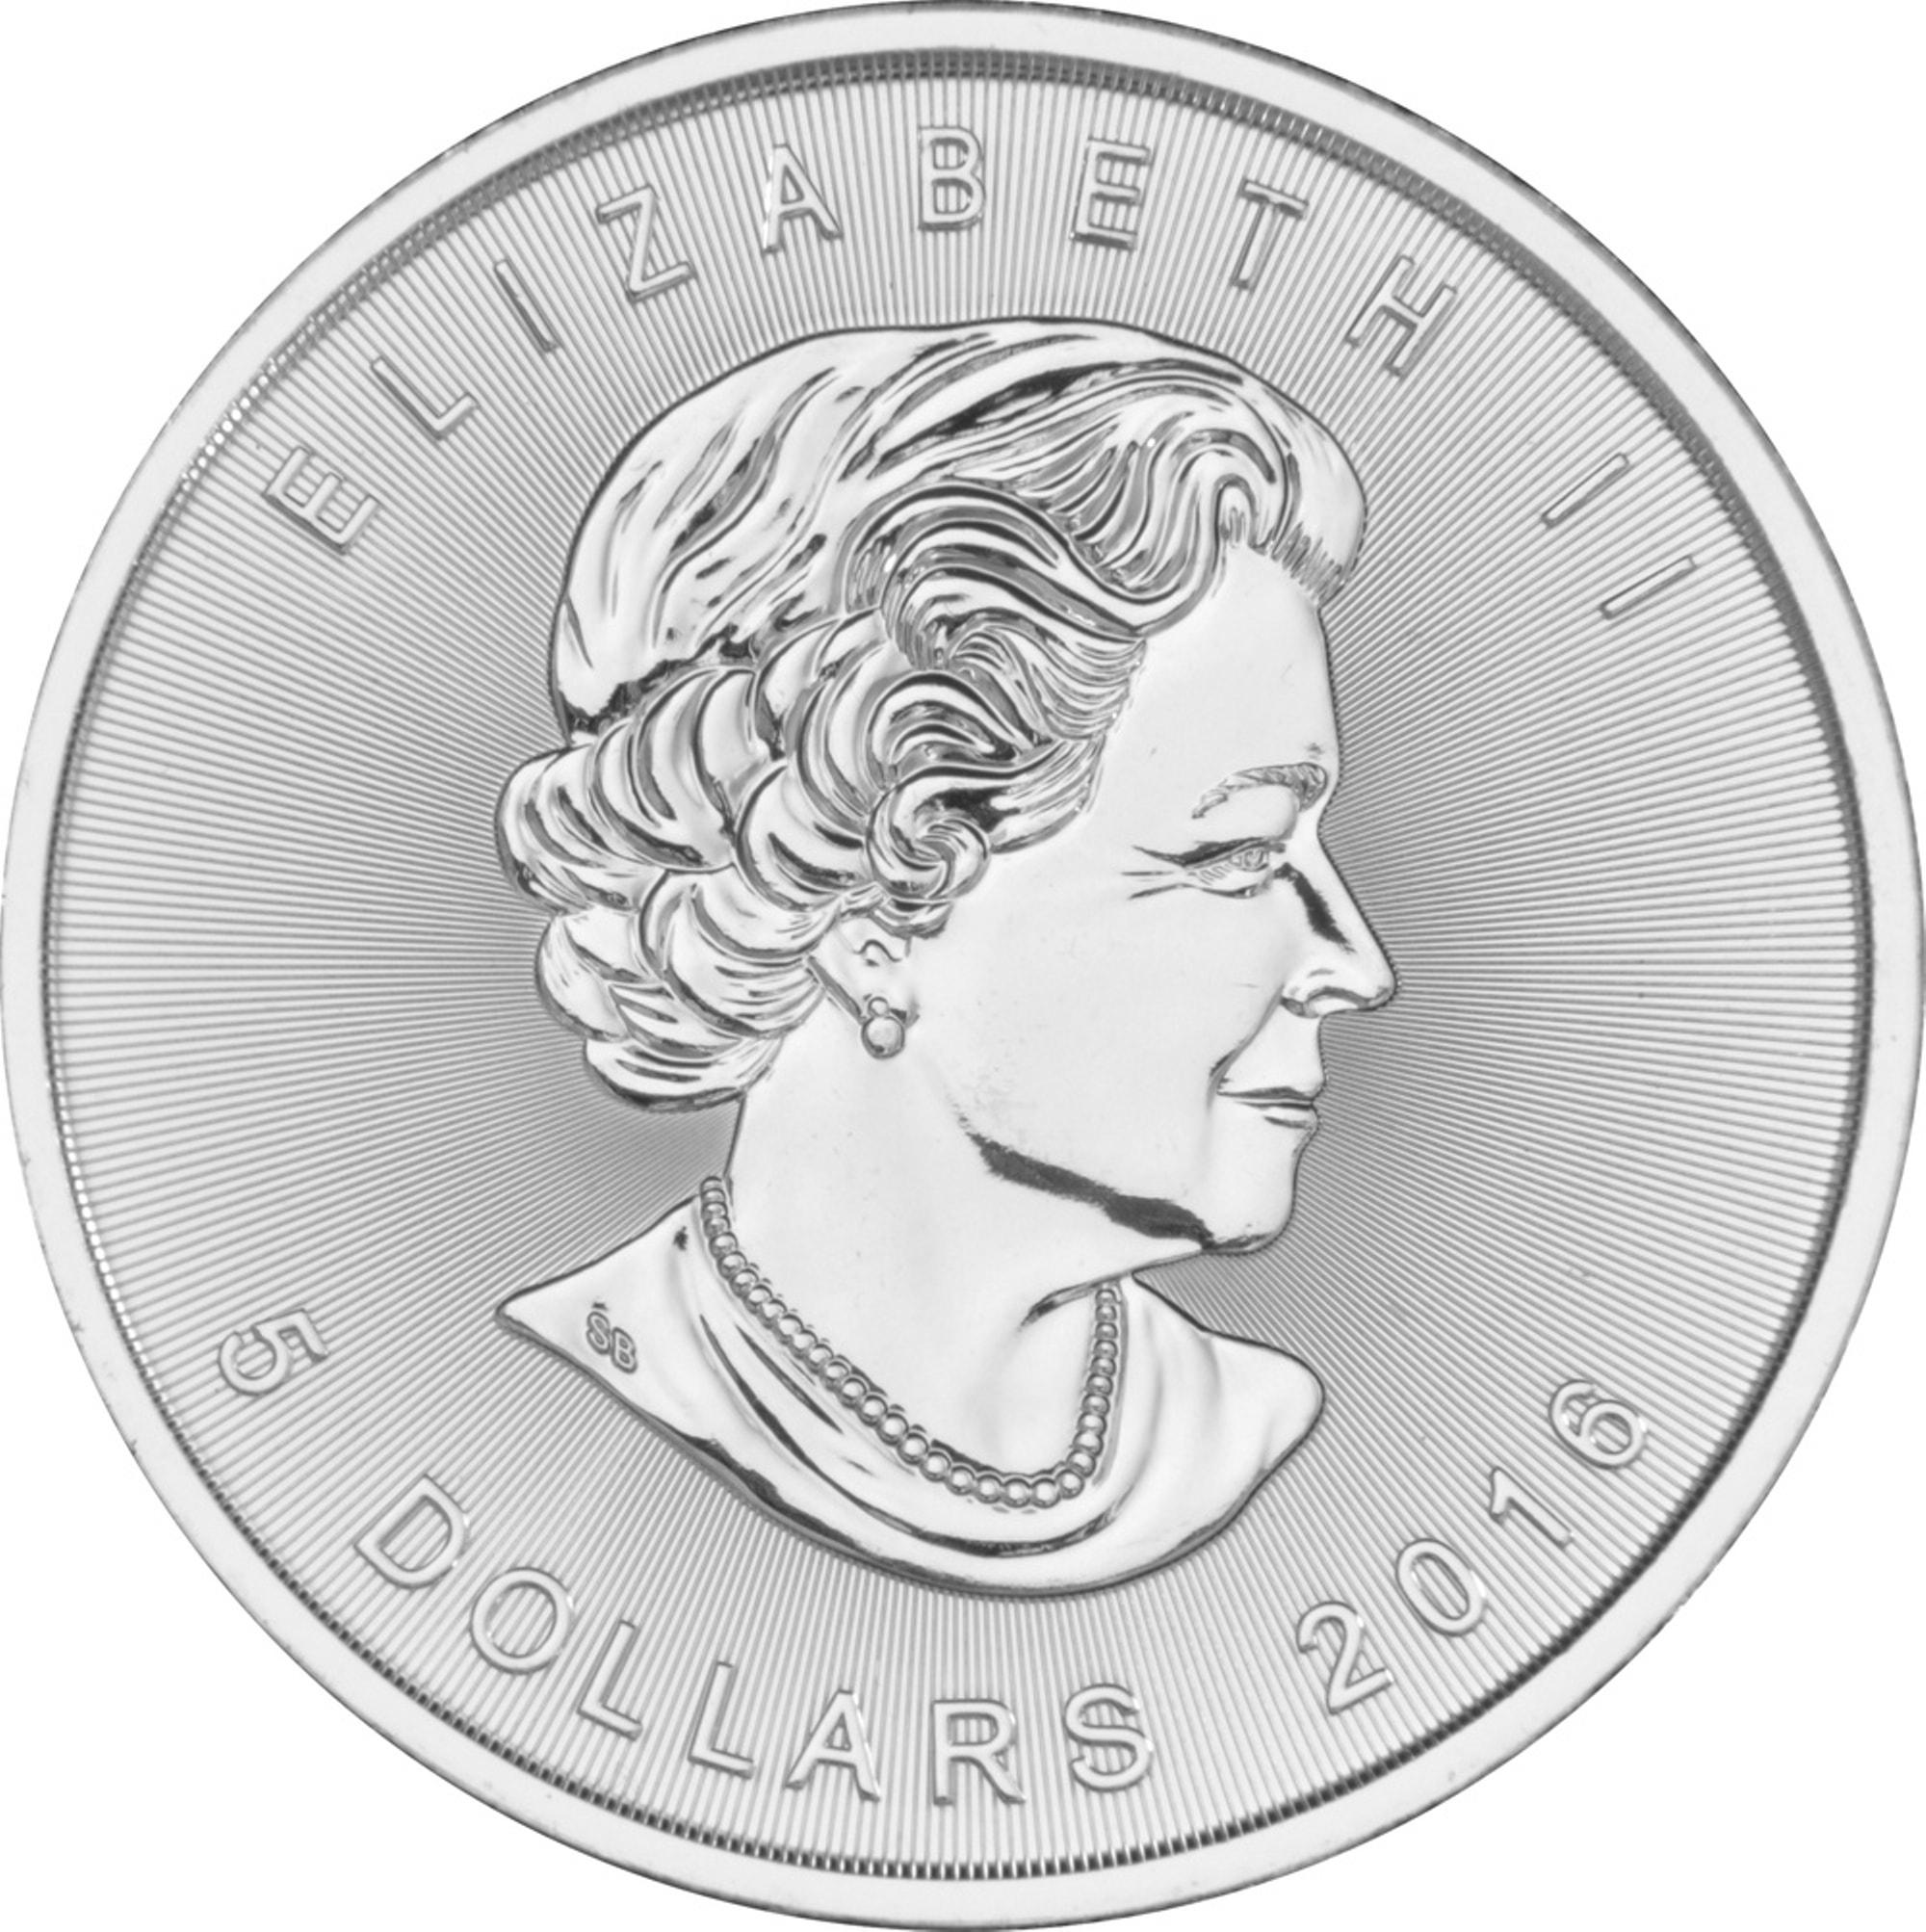 2016 2 - 2016 Fine 999.9 Silver Proof 1oz Canadian Maple $5 Dollars Bullion Coin #21